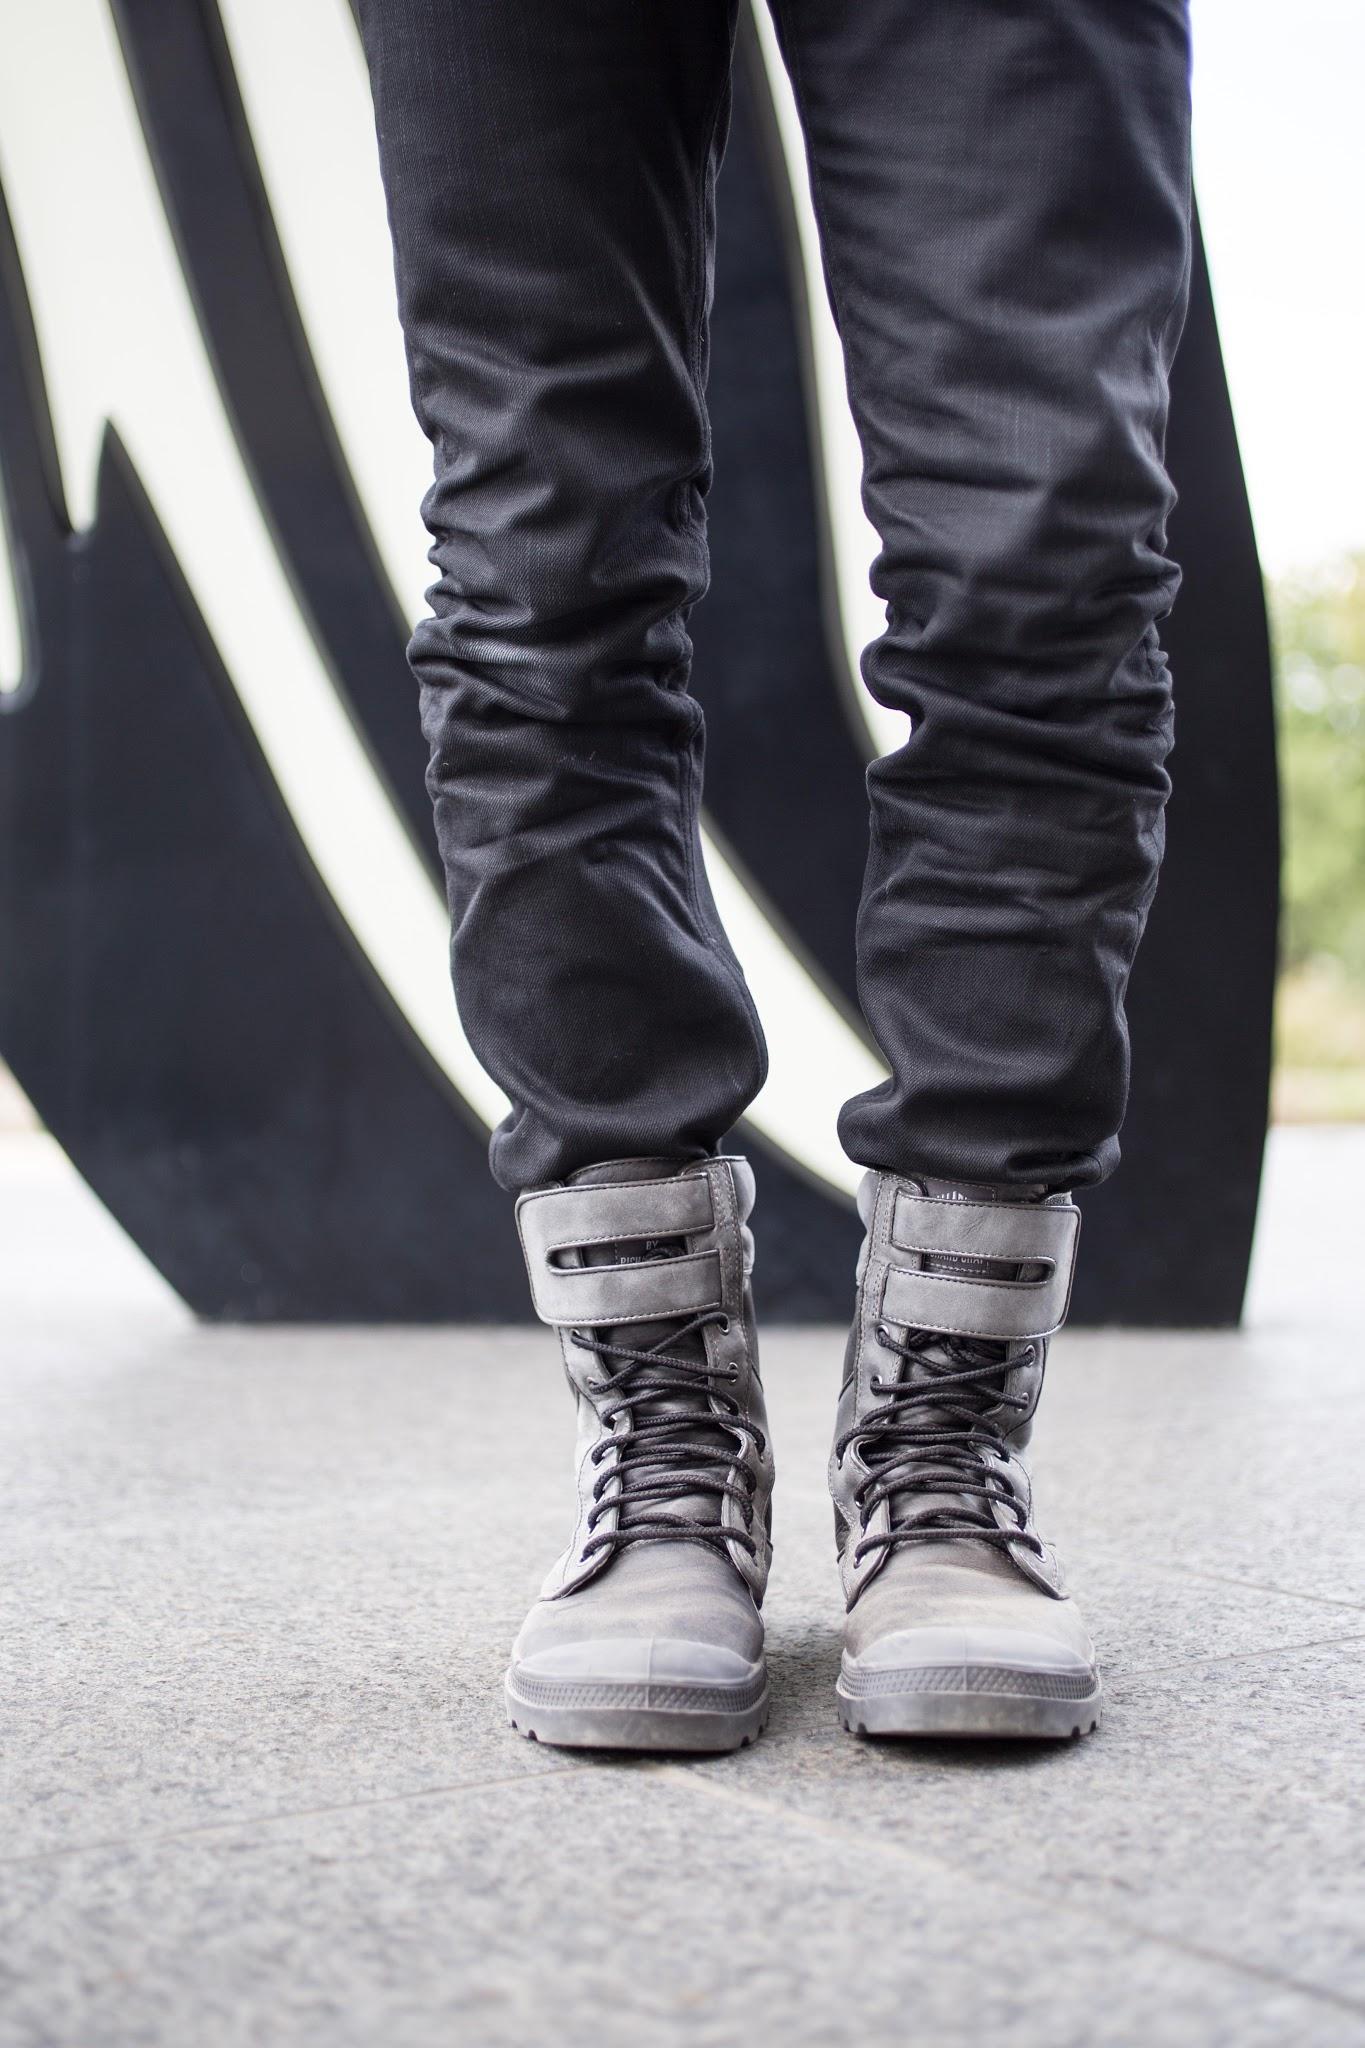 Richard Chai for Palladium Boots